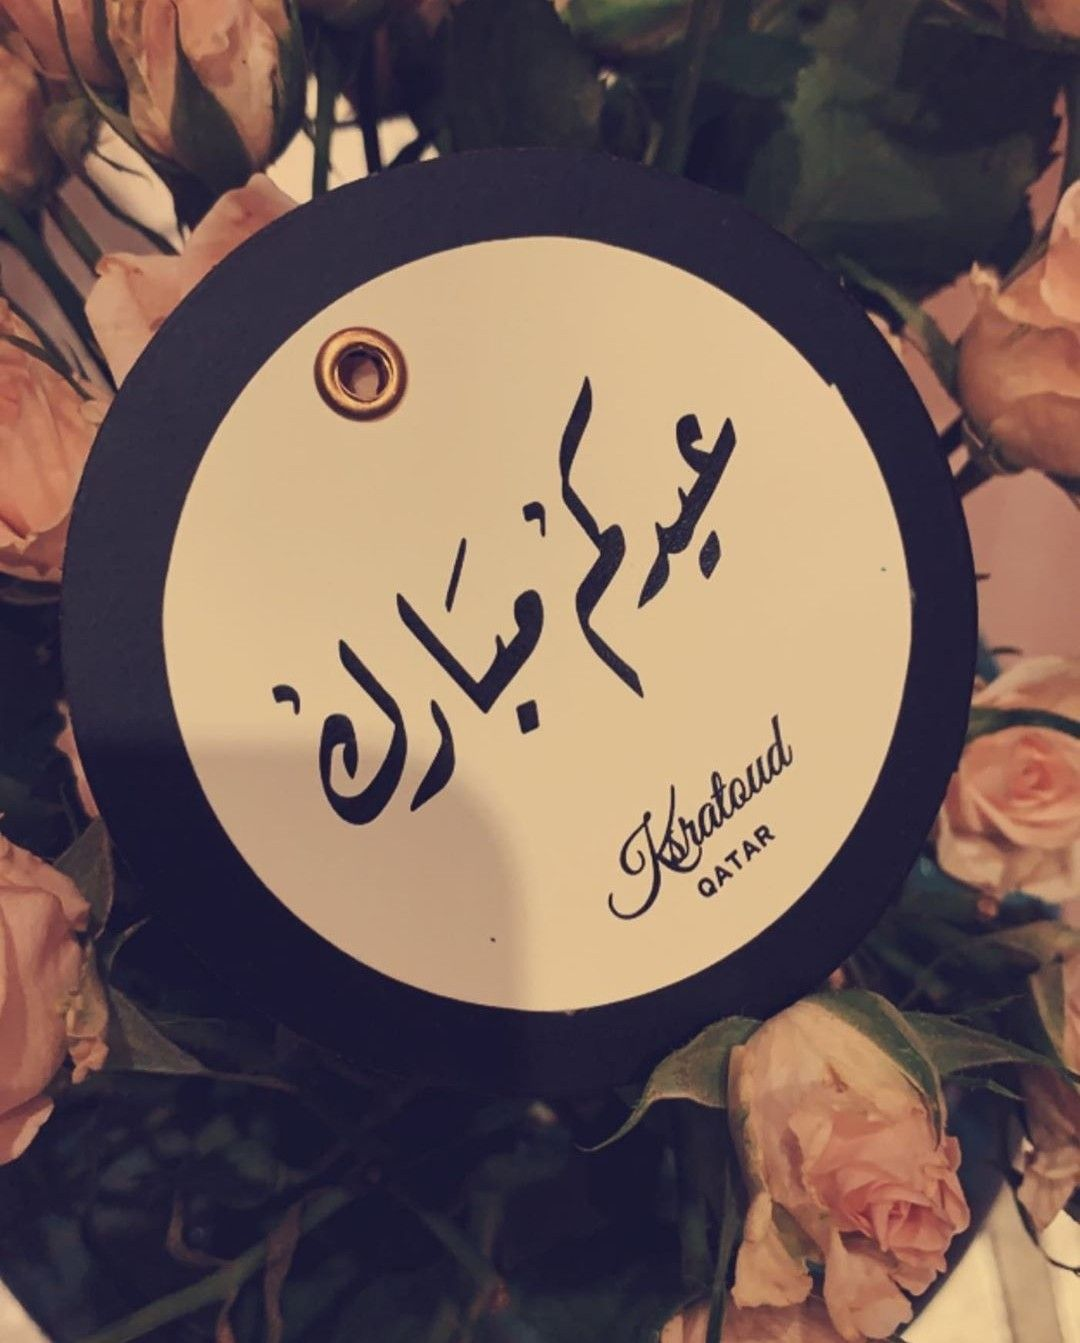 Pin By Tahani Elbasheer On عيد مبارك وسعيد Frisbee Sports